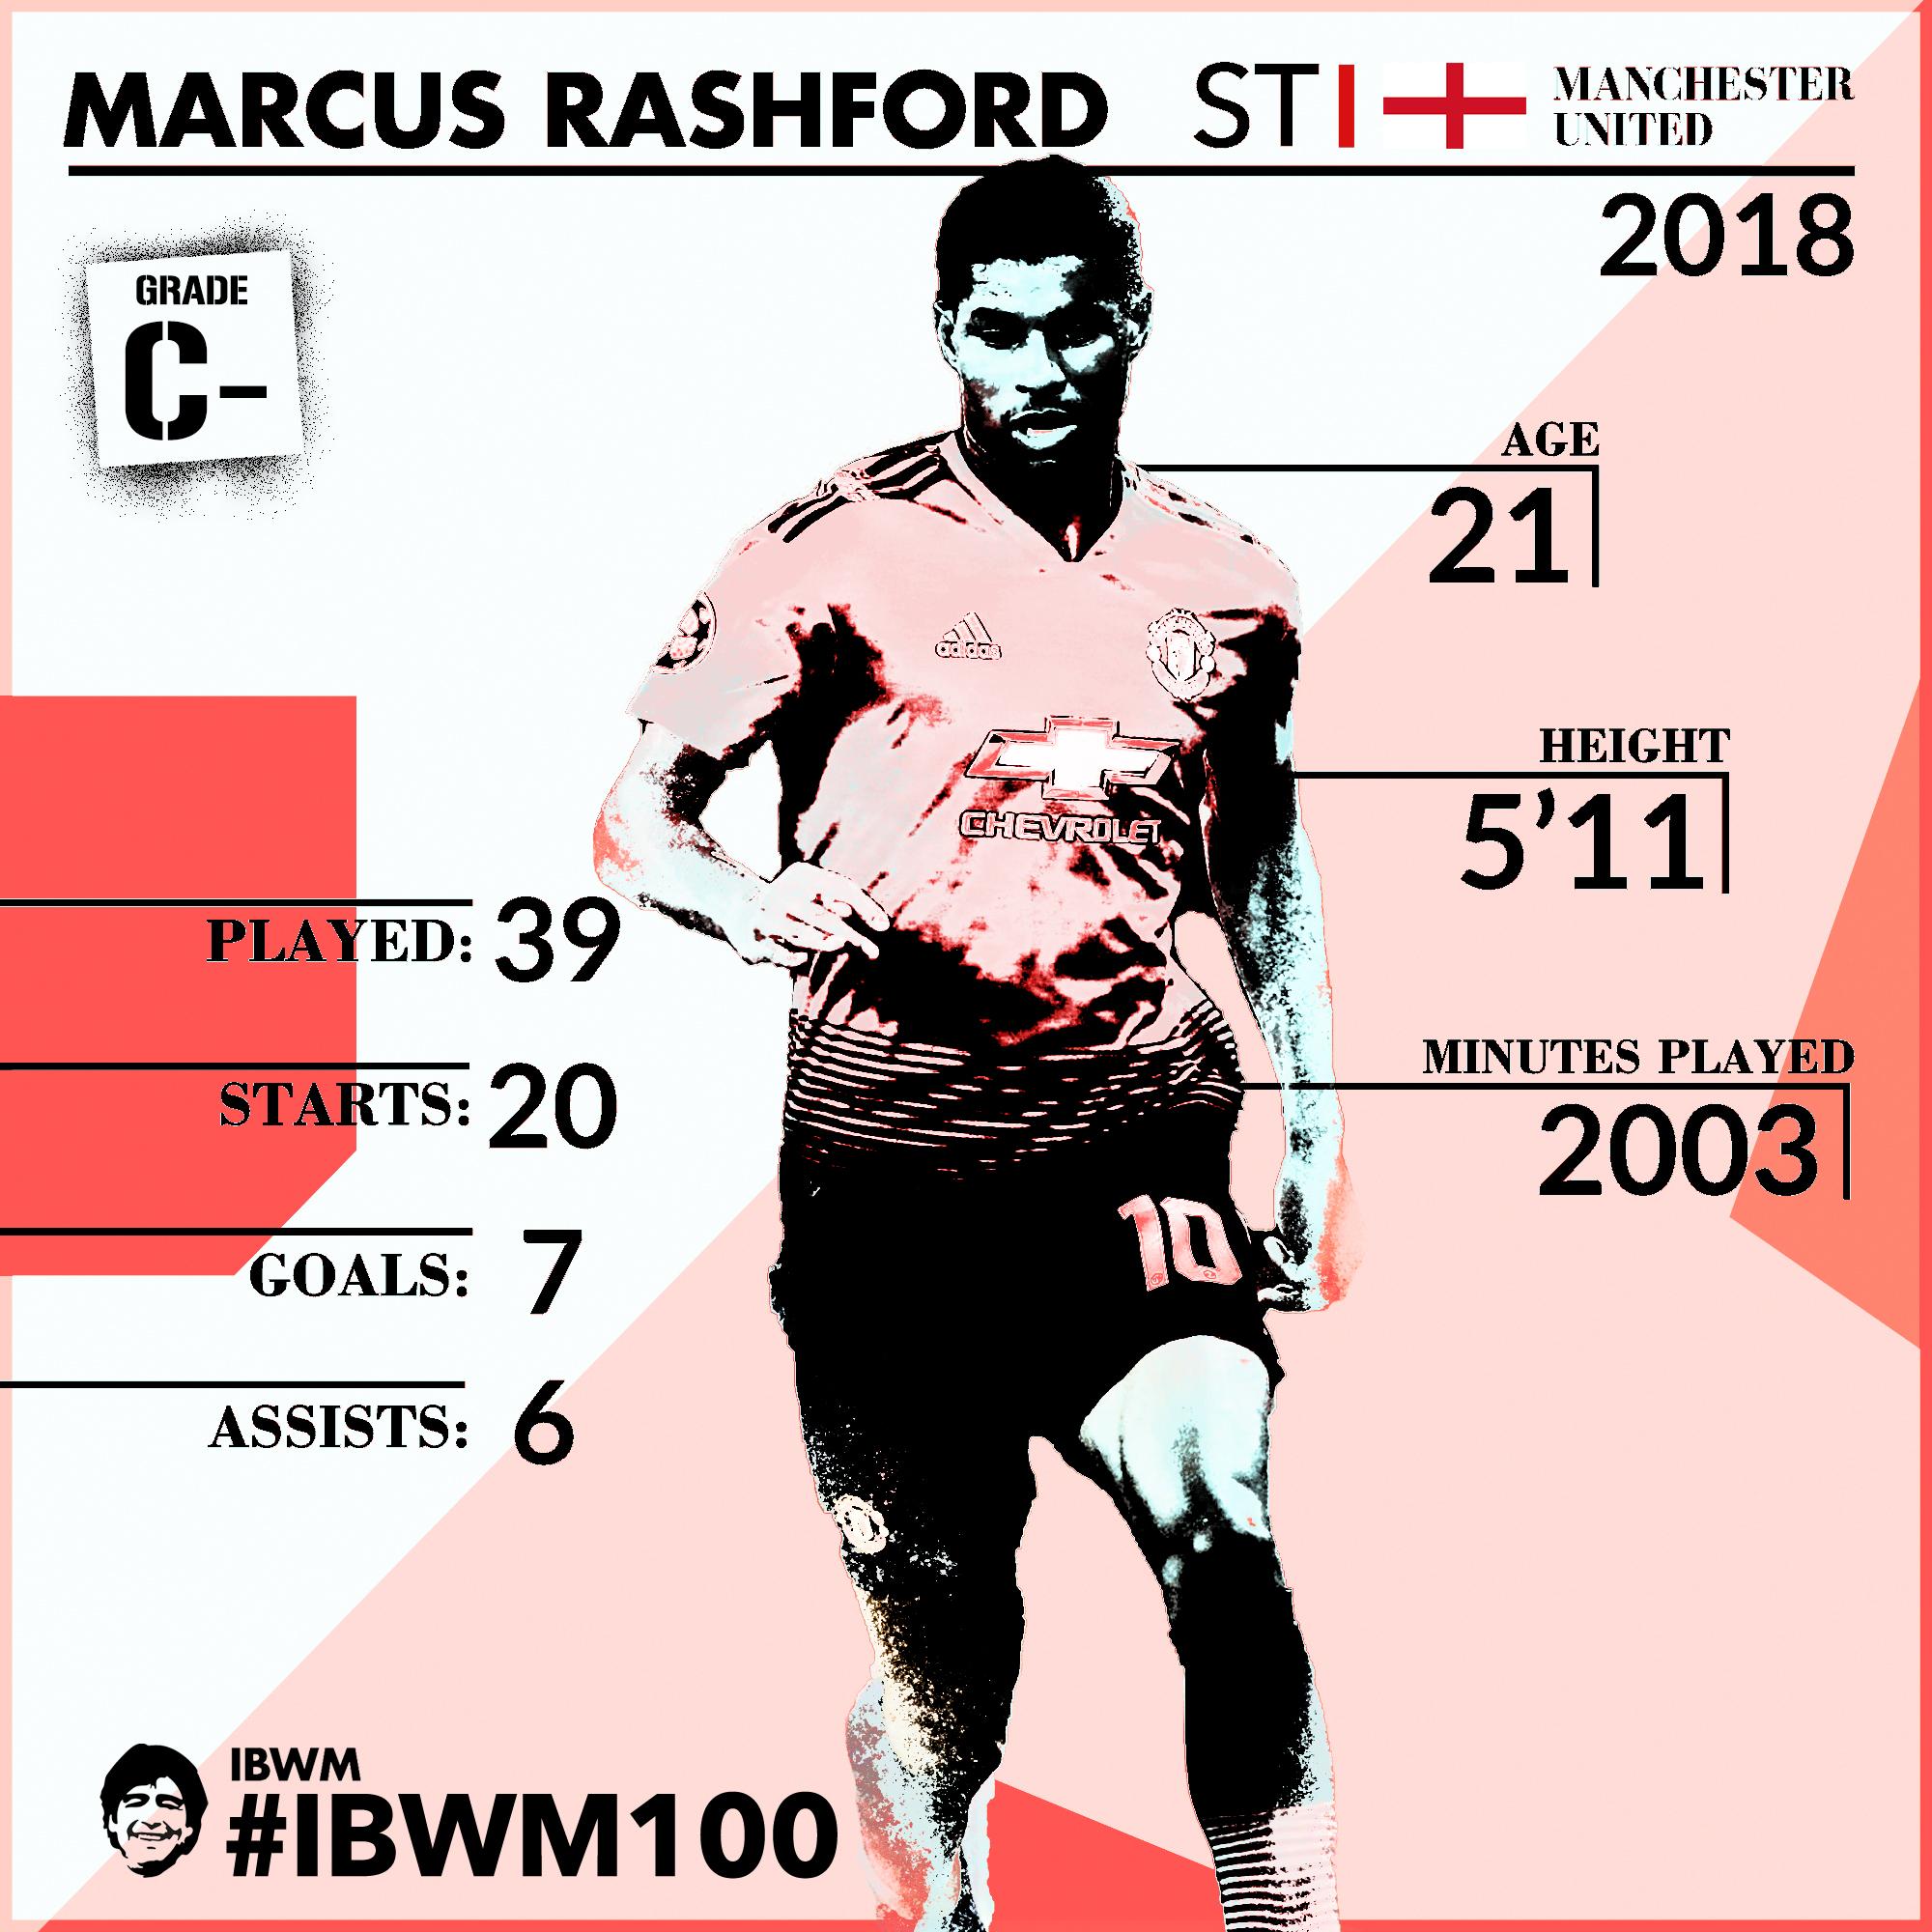 IBWM - Marcus Rashford.jpg